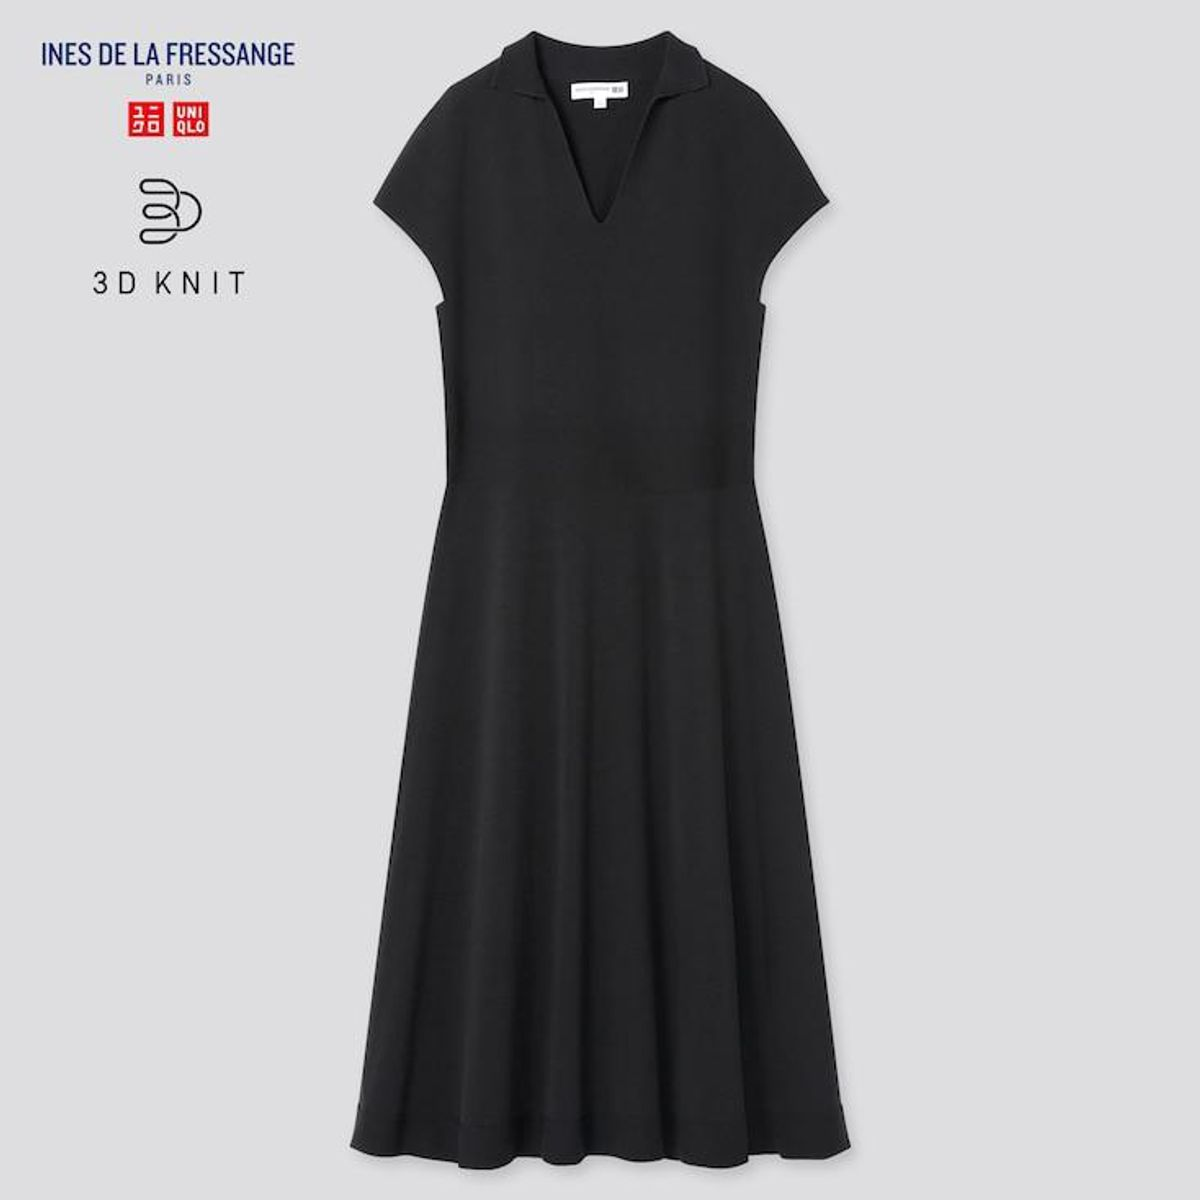 uniqlo ines de la fressange 3d knit short sleeve dress